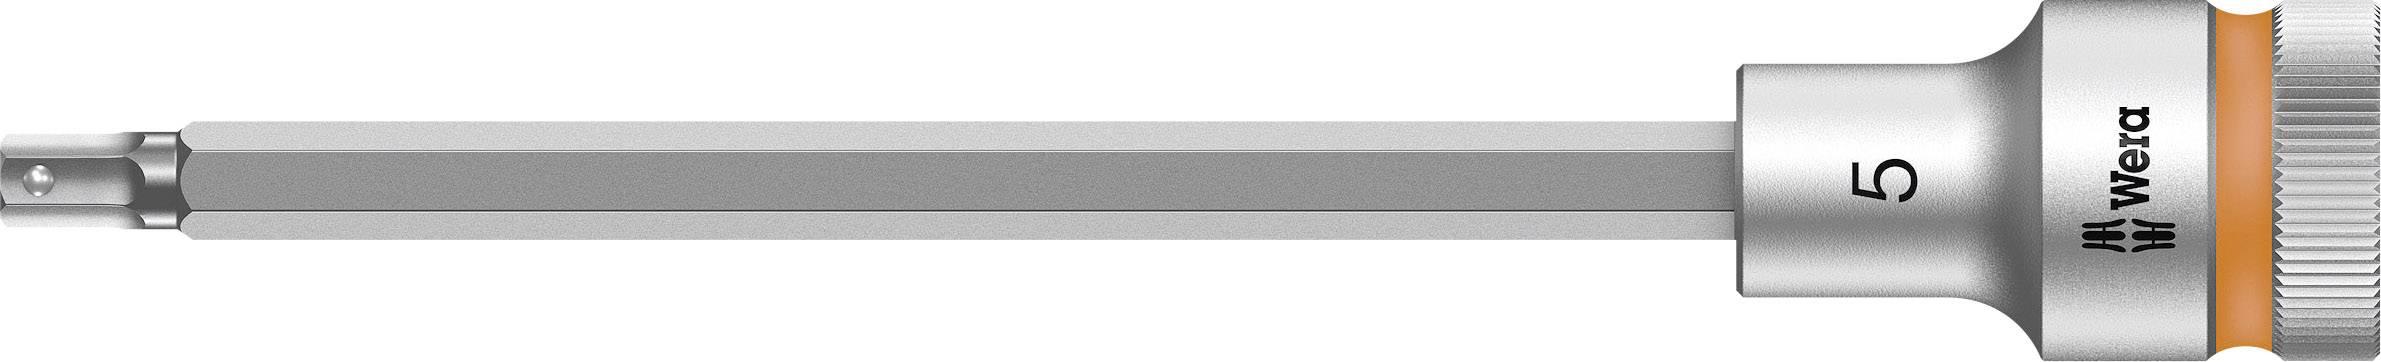 Wera Elektronik-Steckschlüssel 5,0 mm